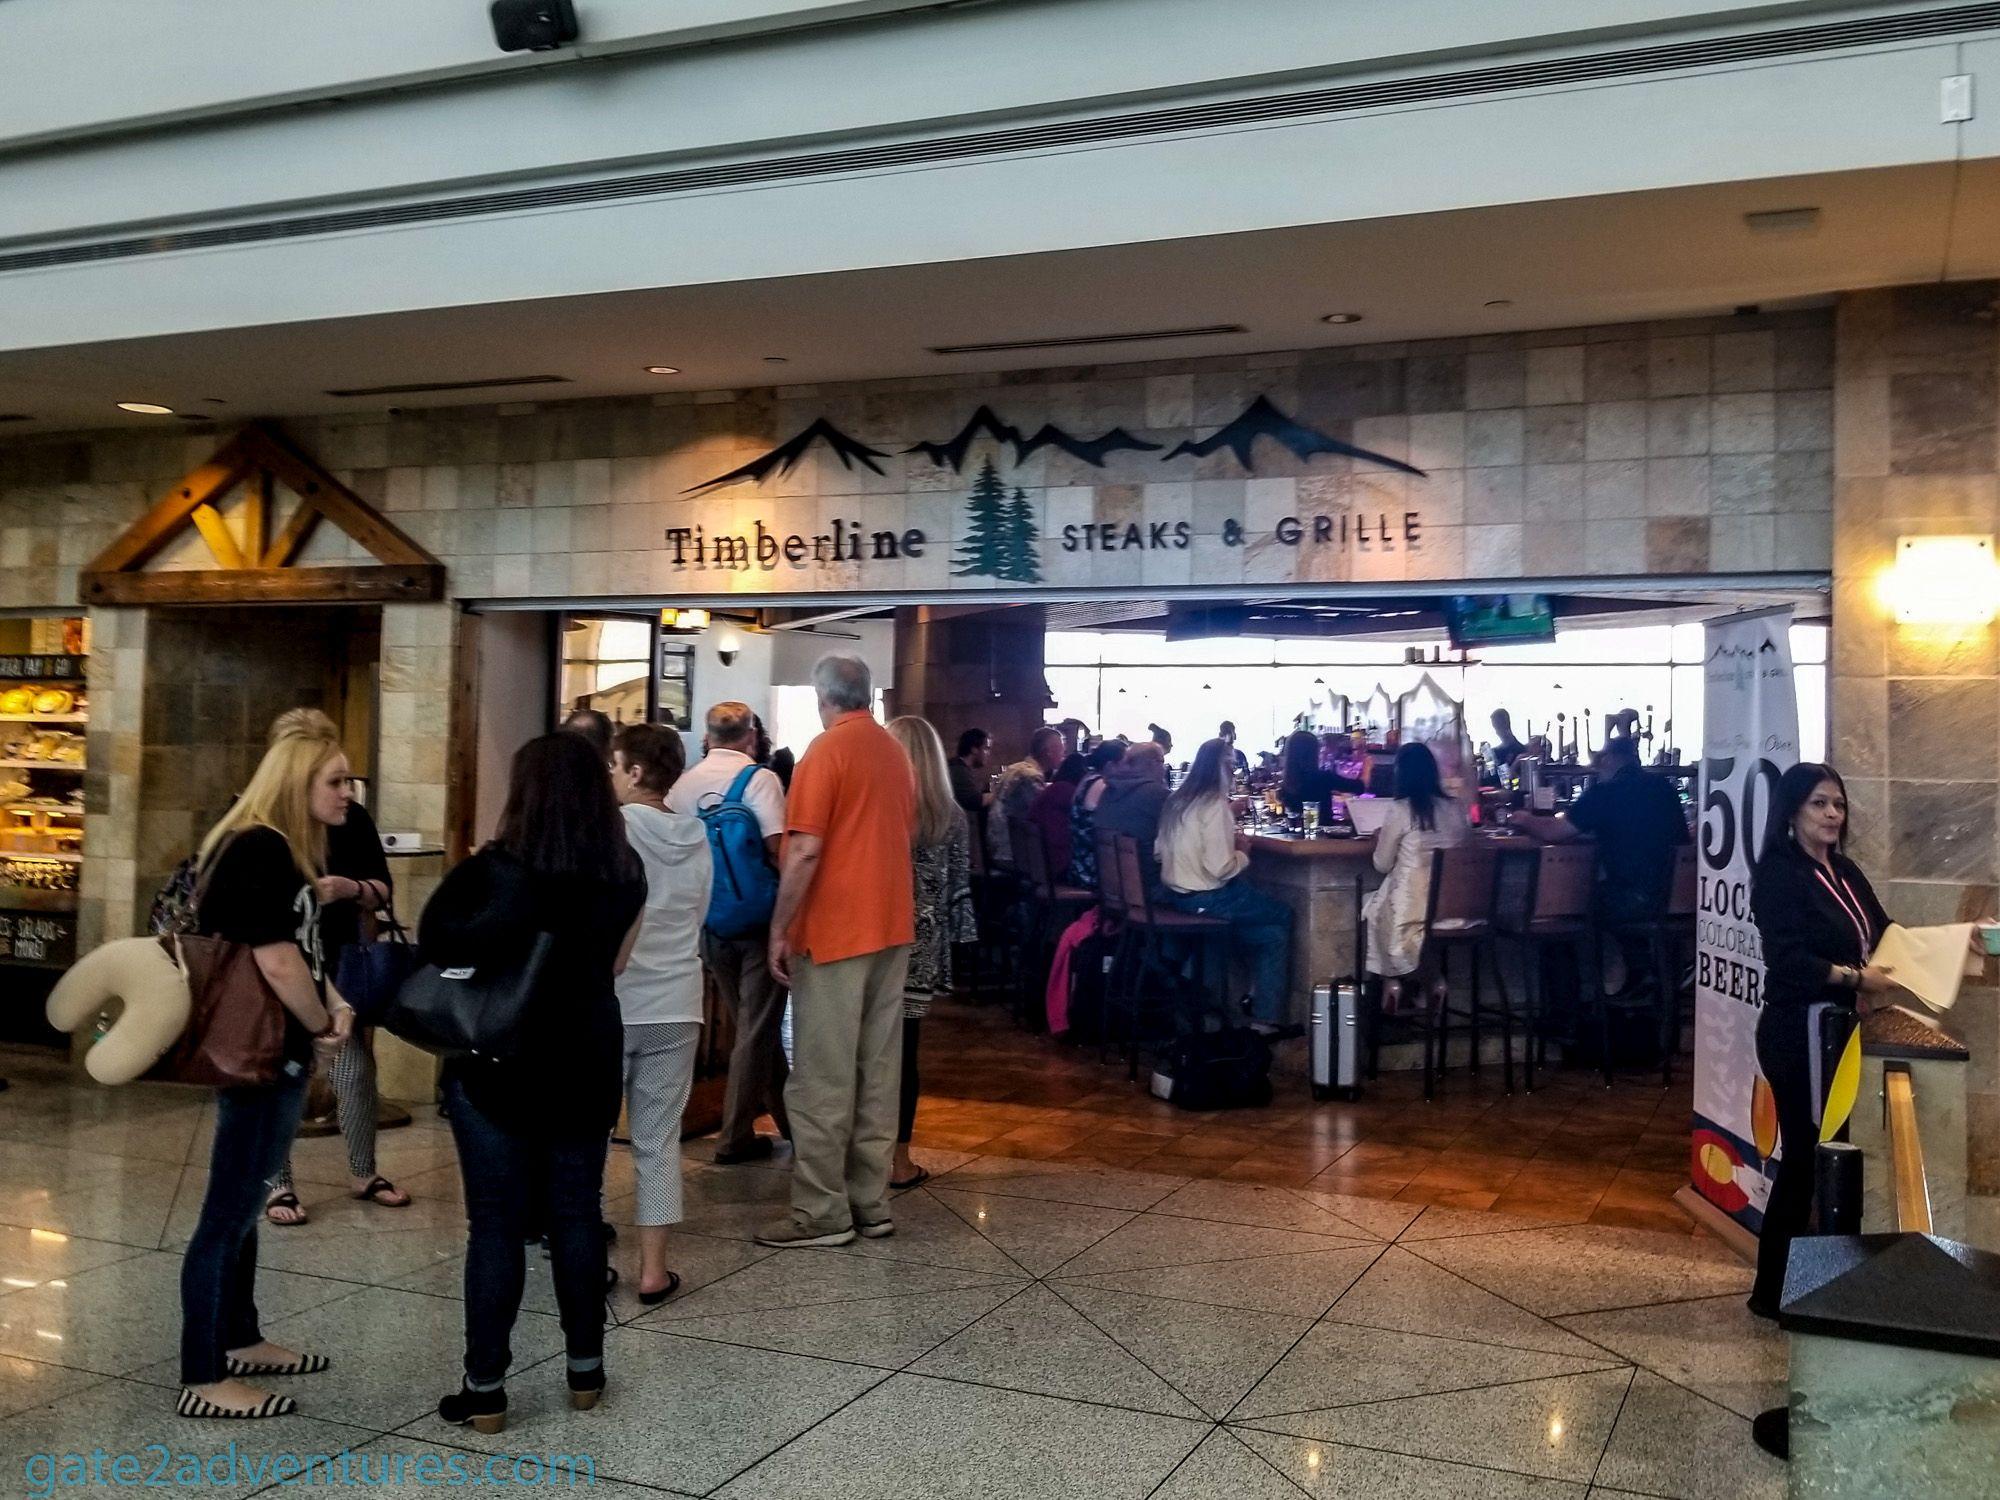 Airport Restaurant: Timberline Steaks & Grille – Denver (DEN)